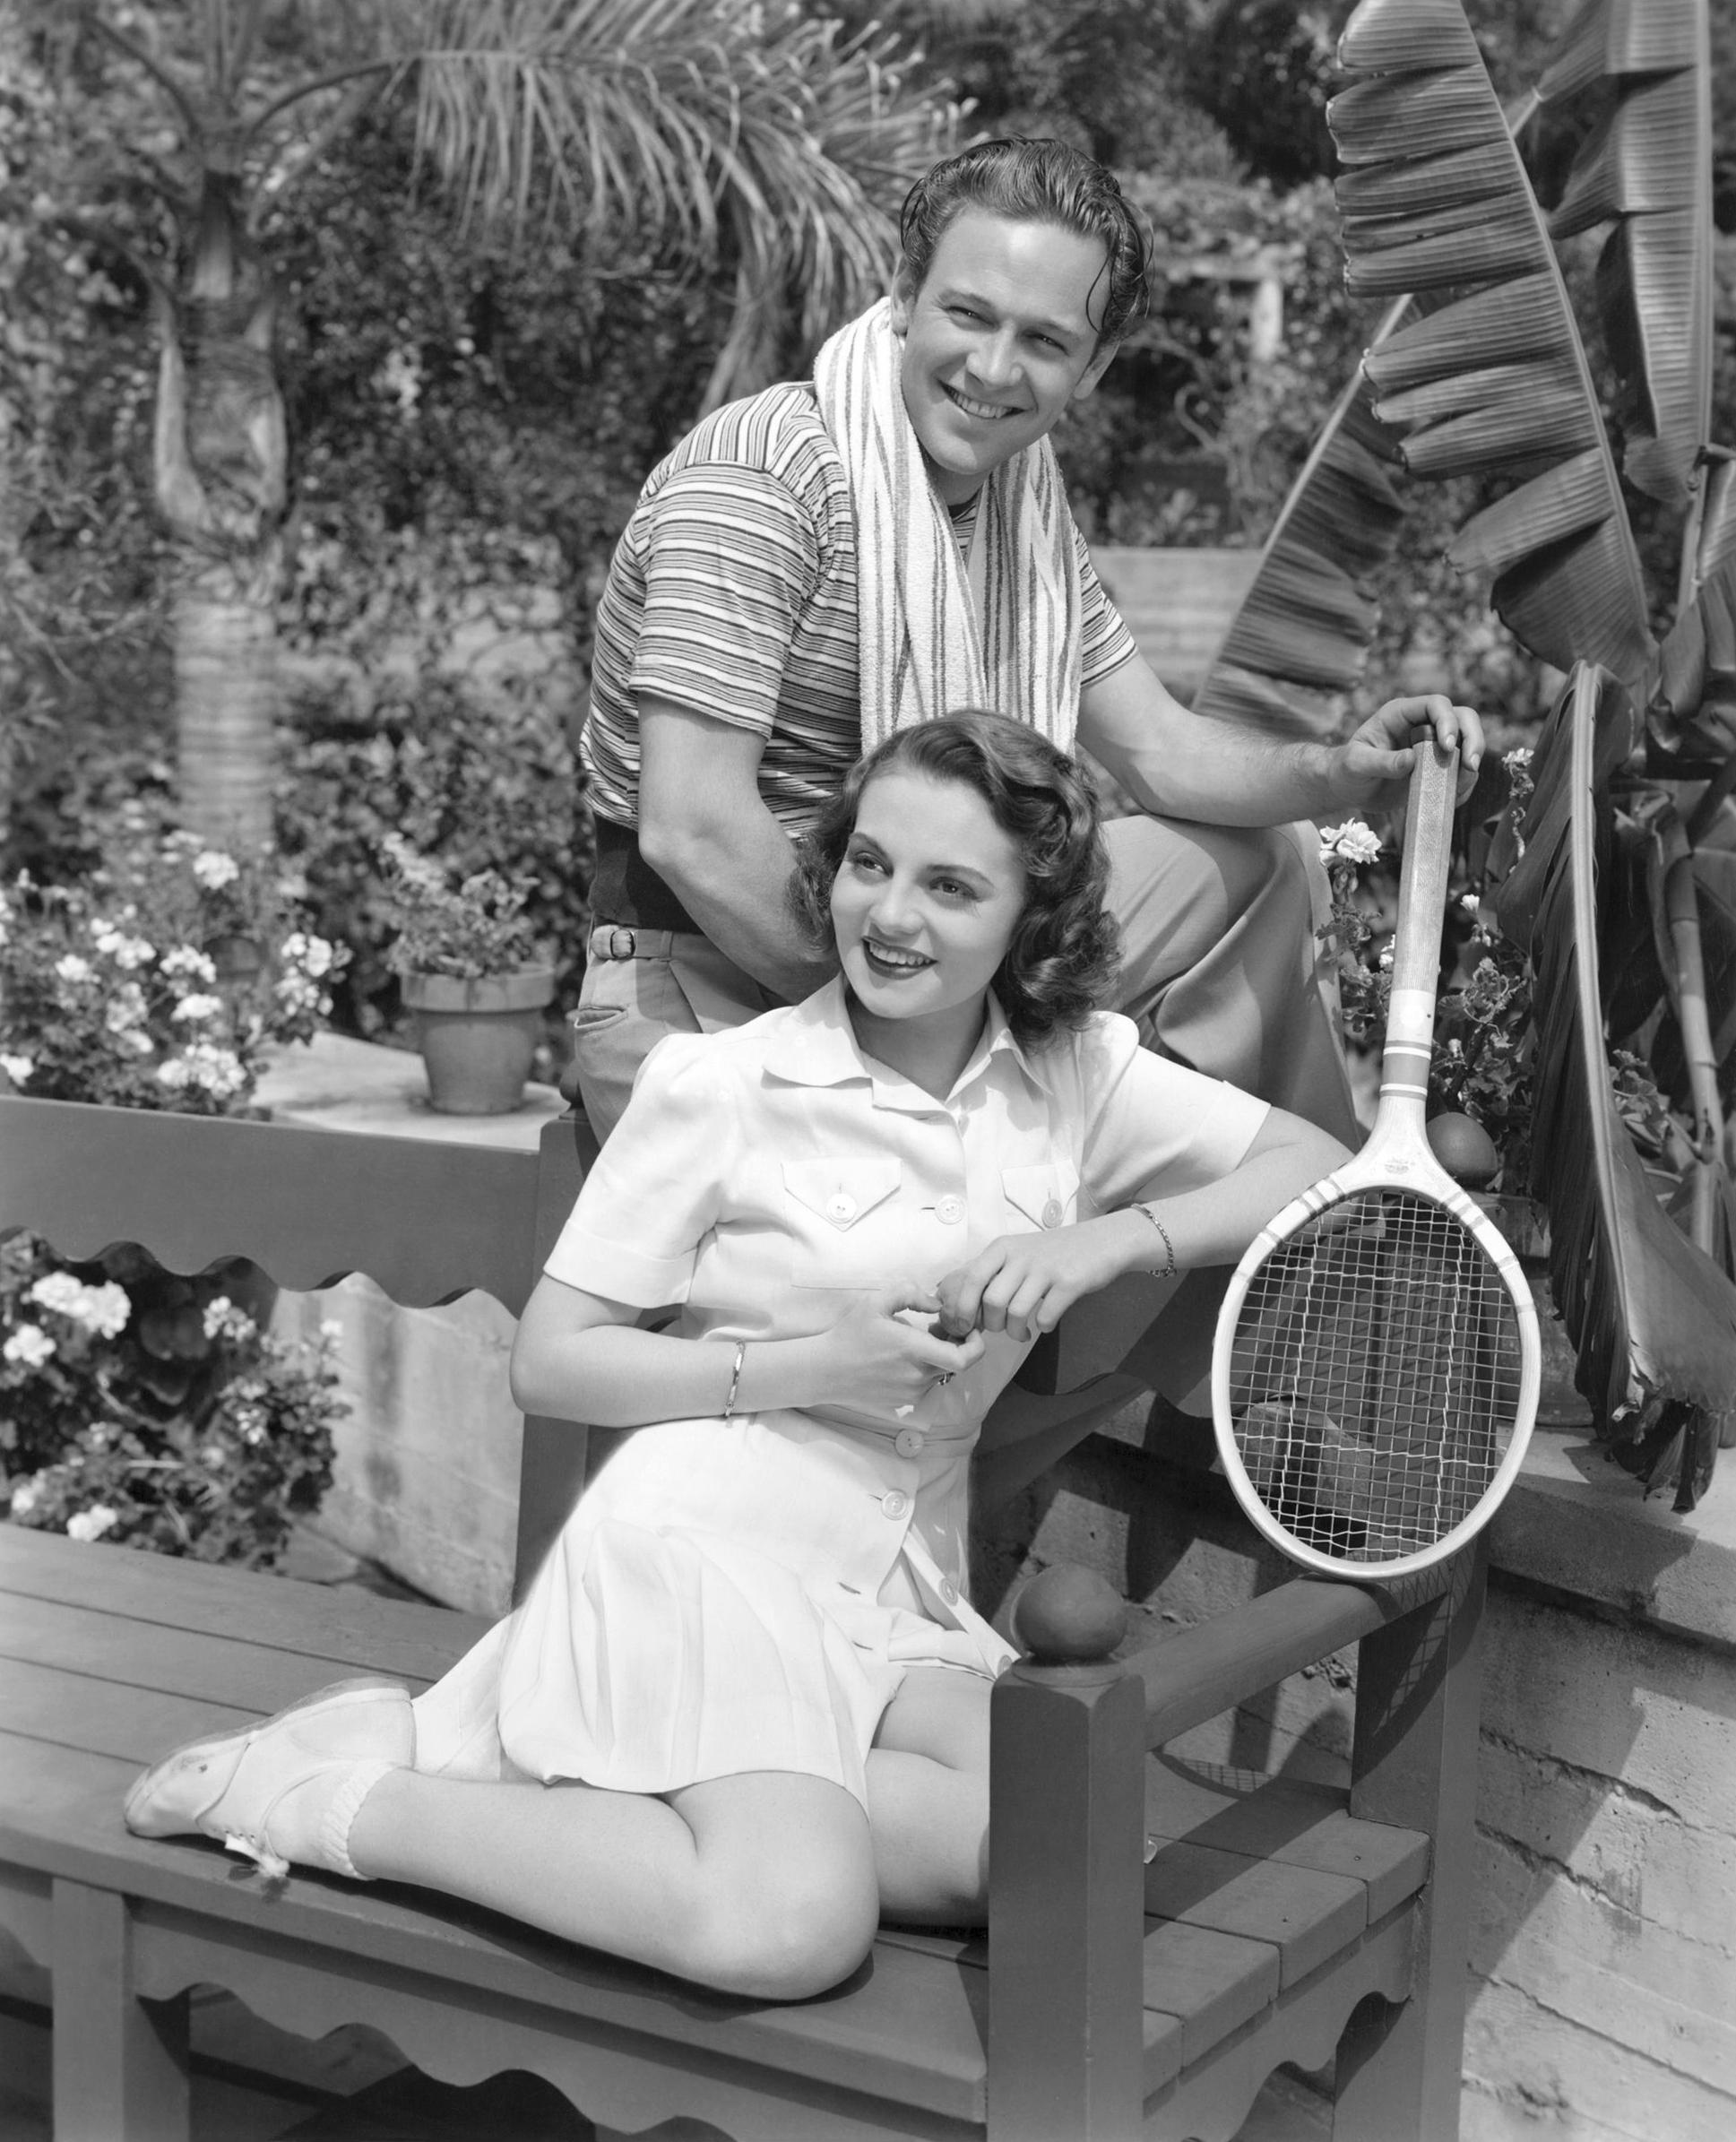 Jeanne Cagney nudes (88 photo), Topless, Bikini, Selfie, legs 2006